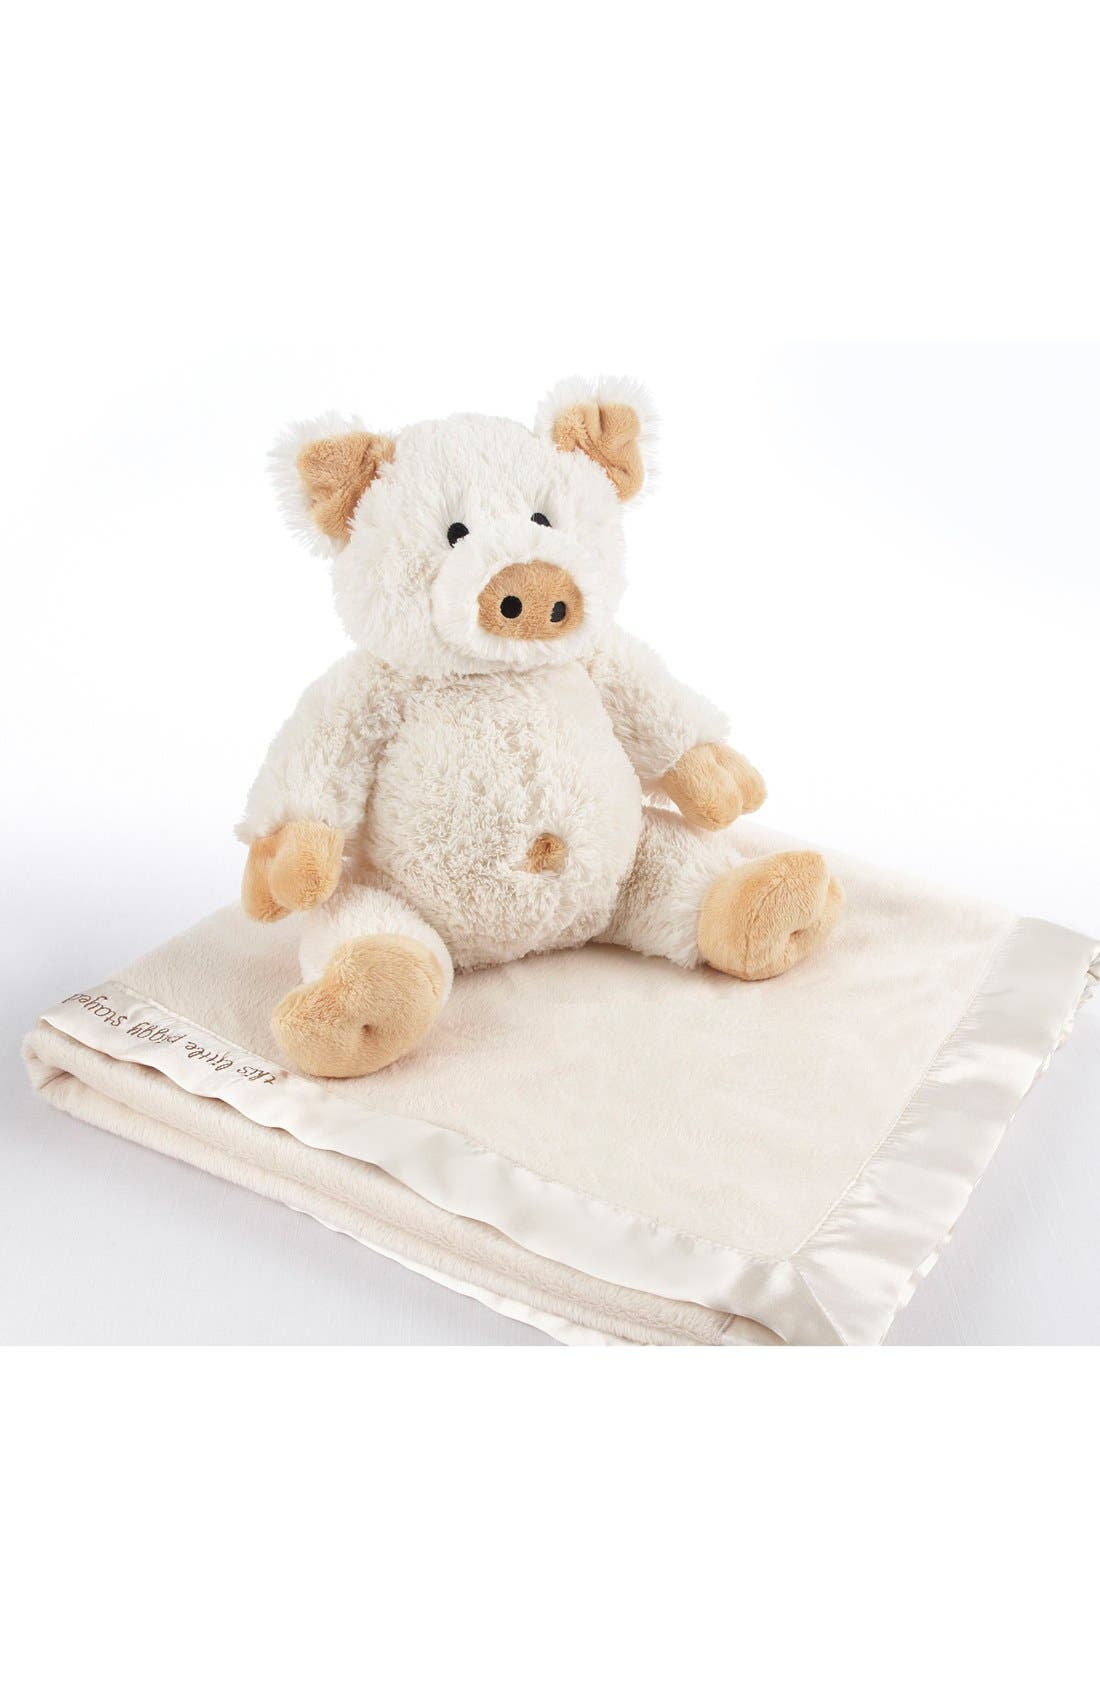 Main Image - Baby Aspen Pig Stuffed Animal & Blanket Set